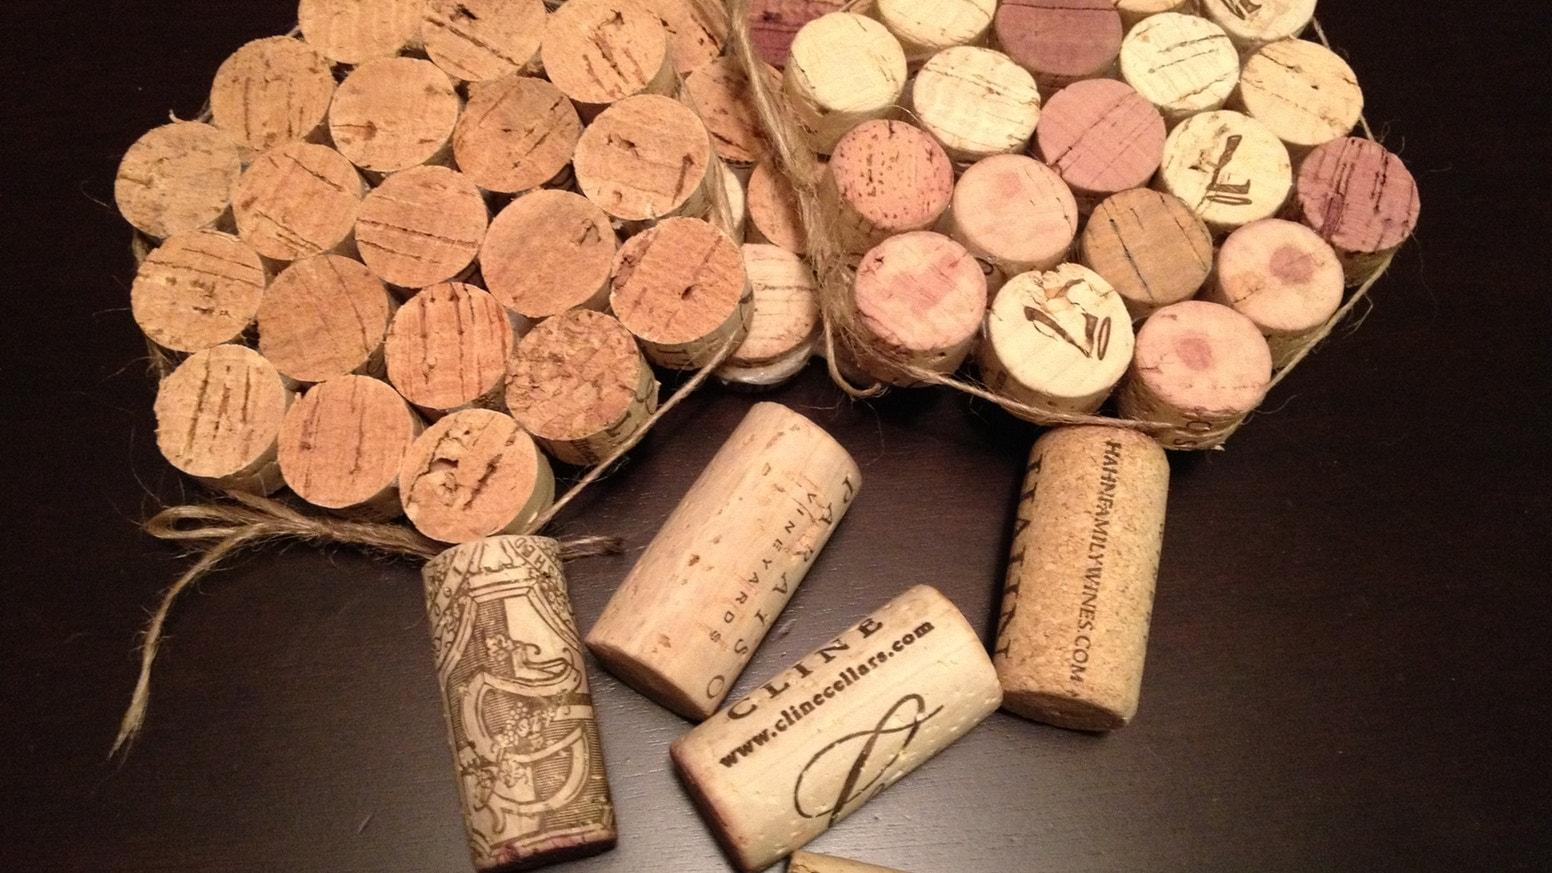 Uses of cork, cork plug